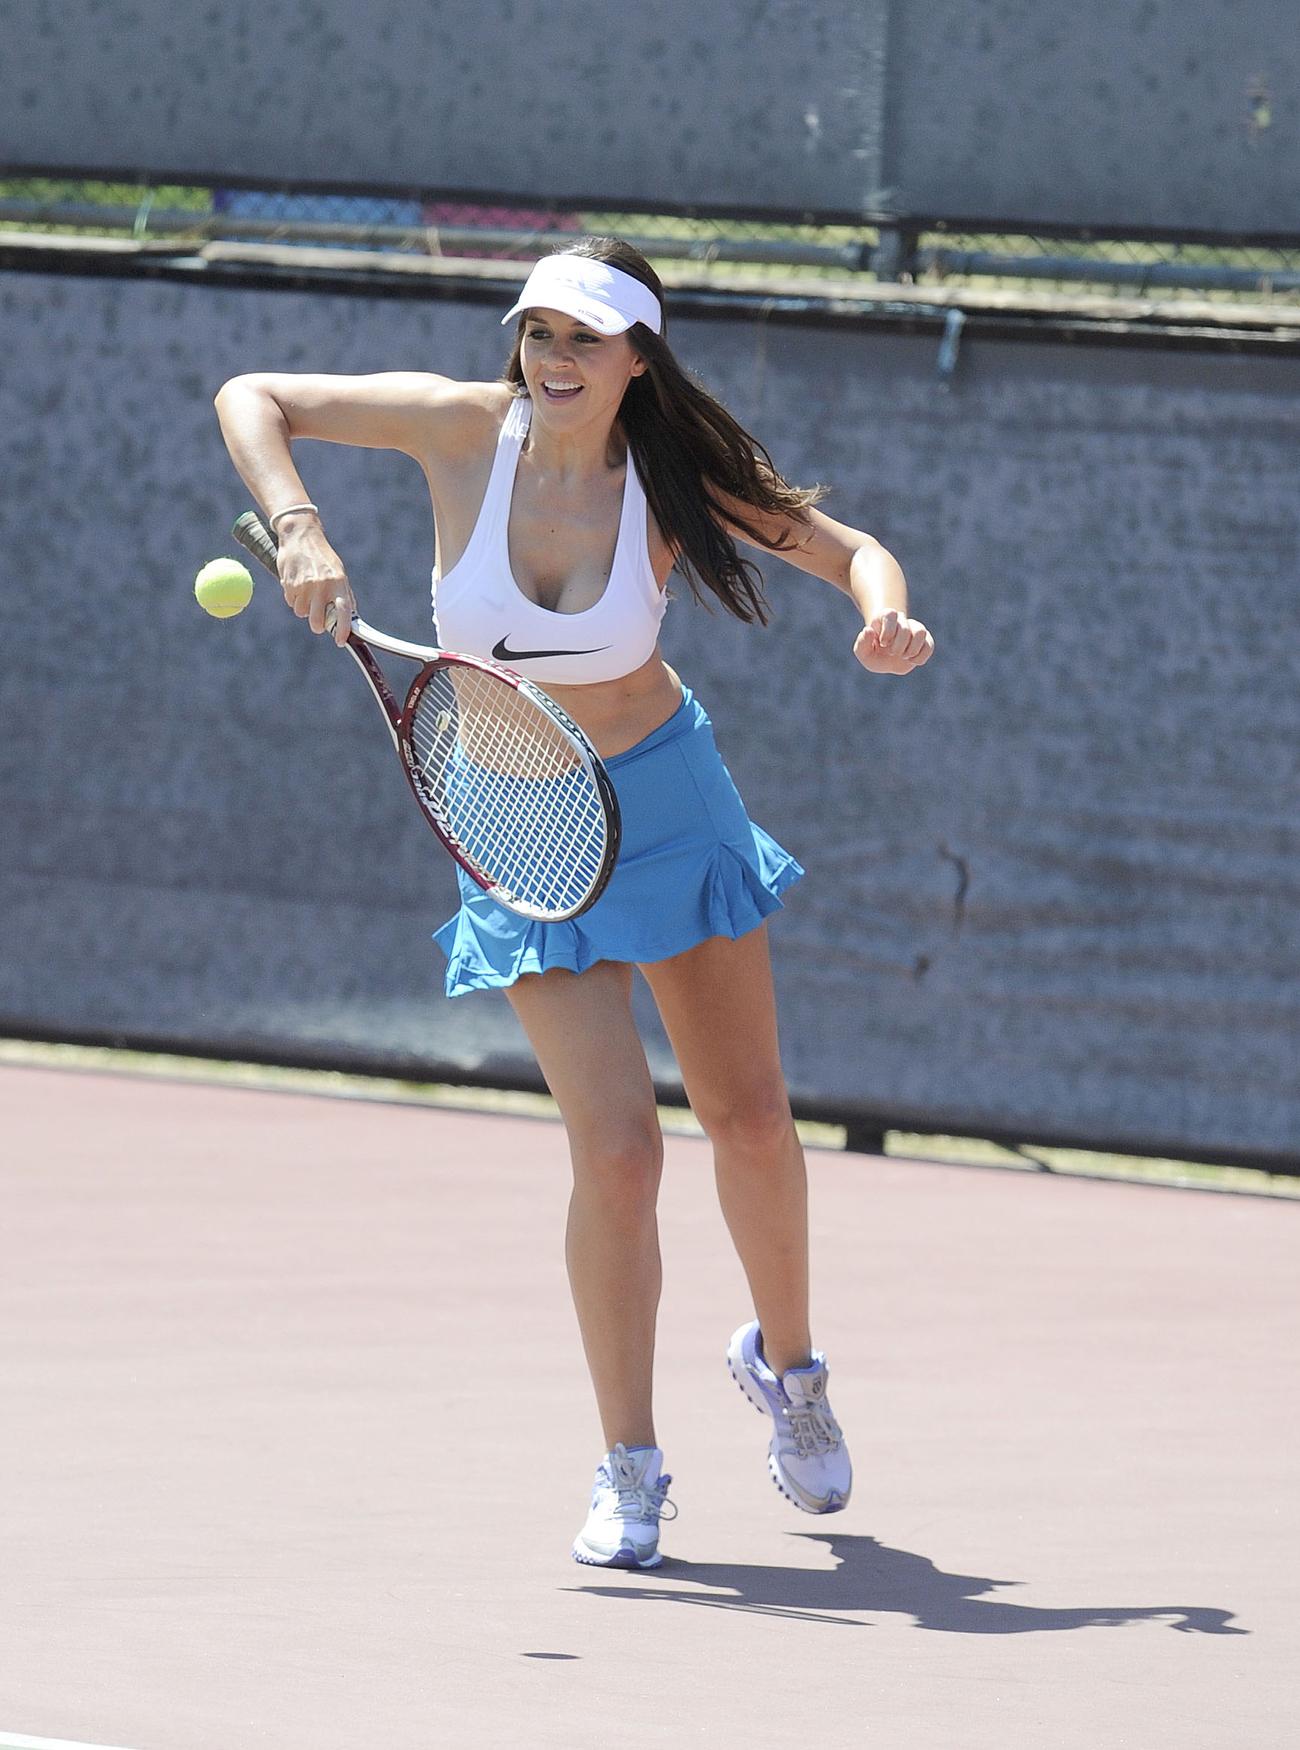 imogen-thomas-looks-hot-while-playing-tennis-03 | GotCeleb